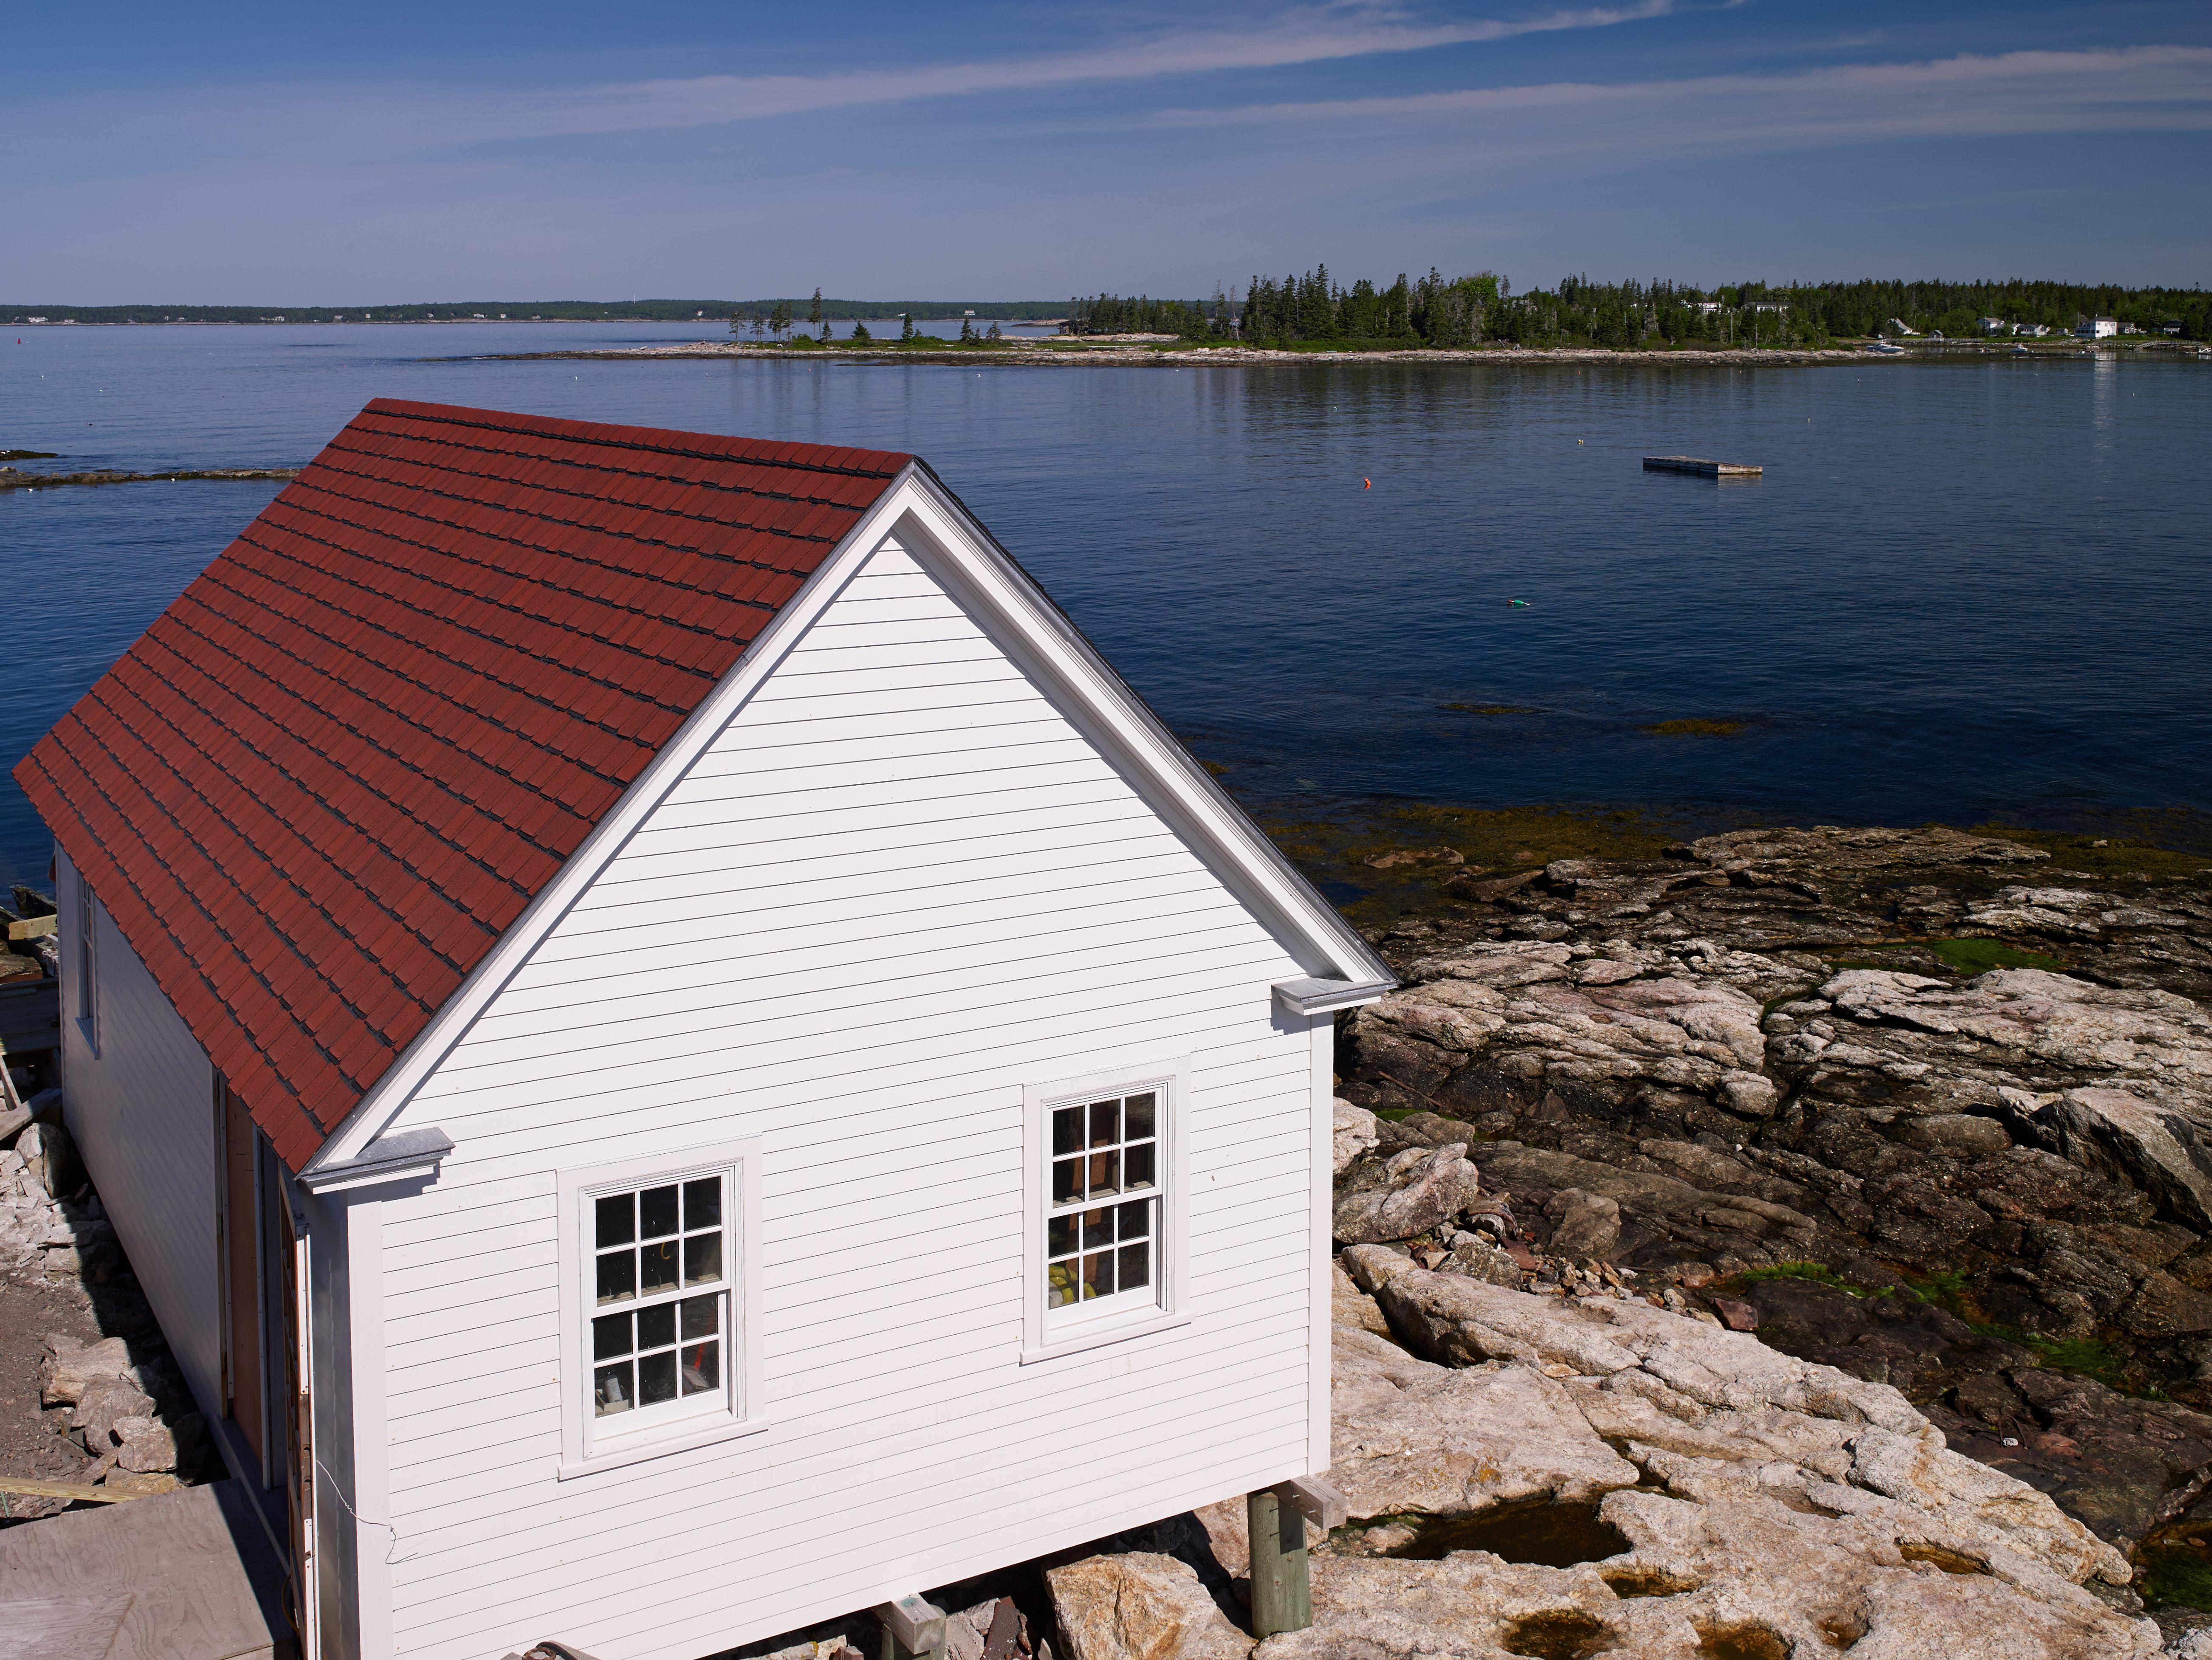 Cuckolds Boathouse